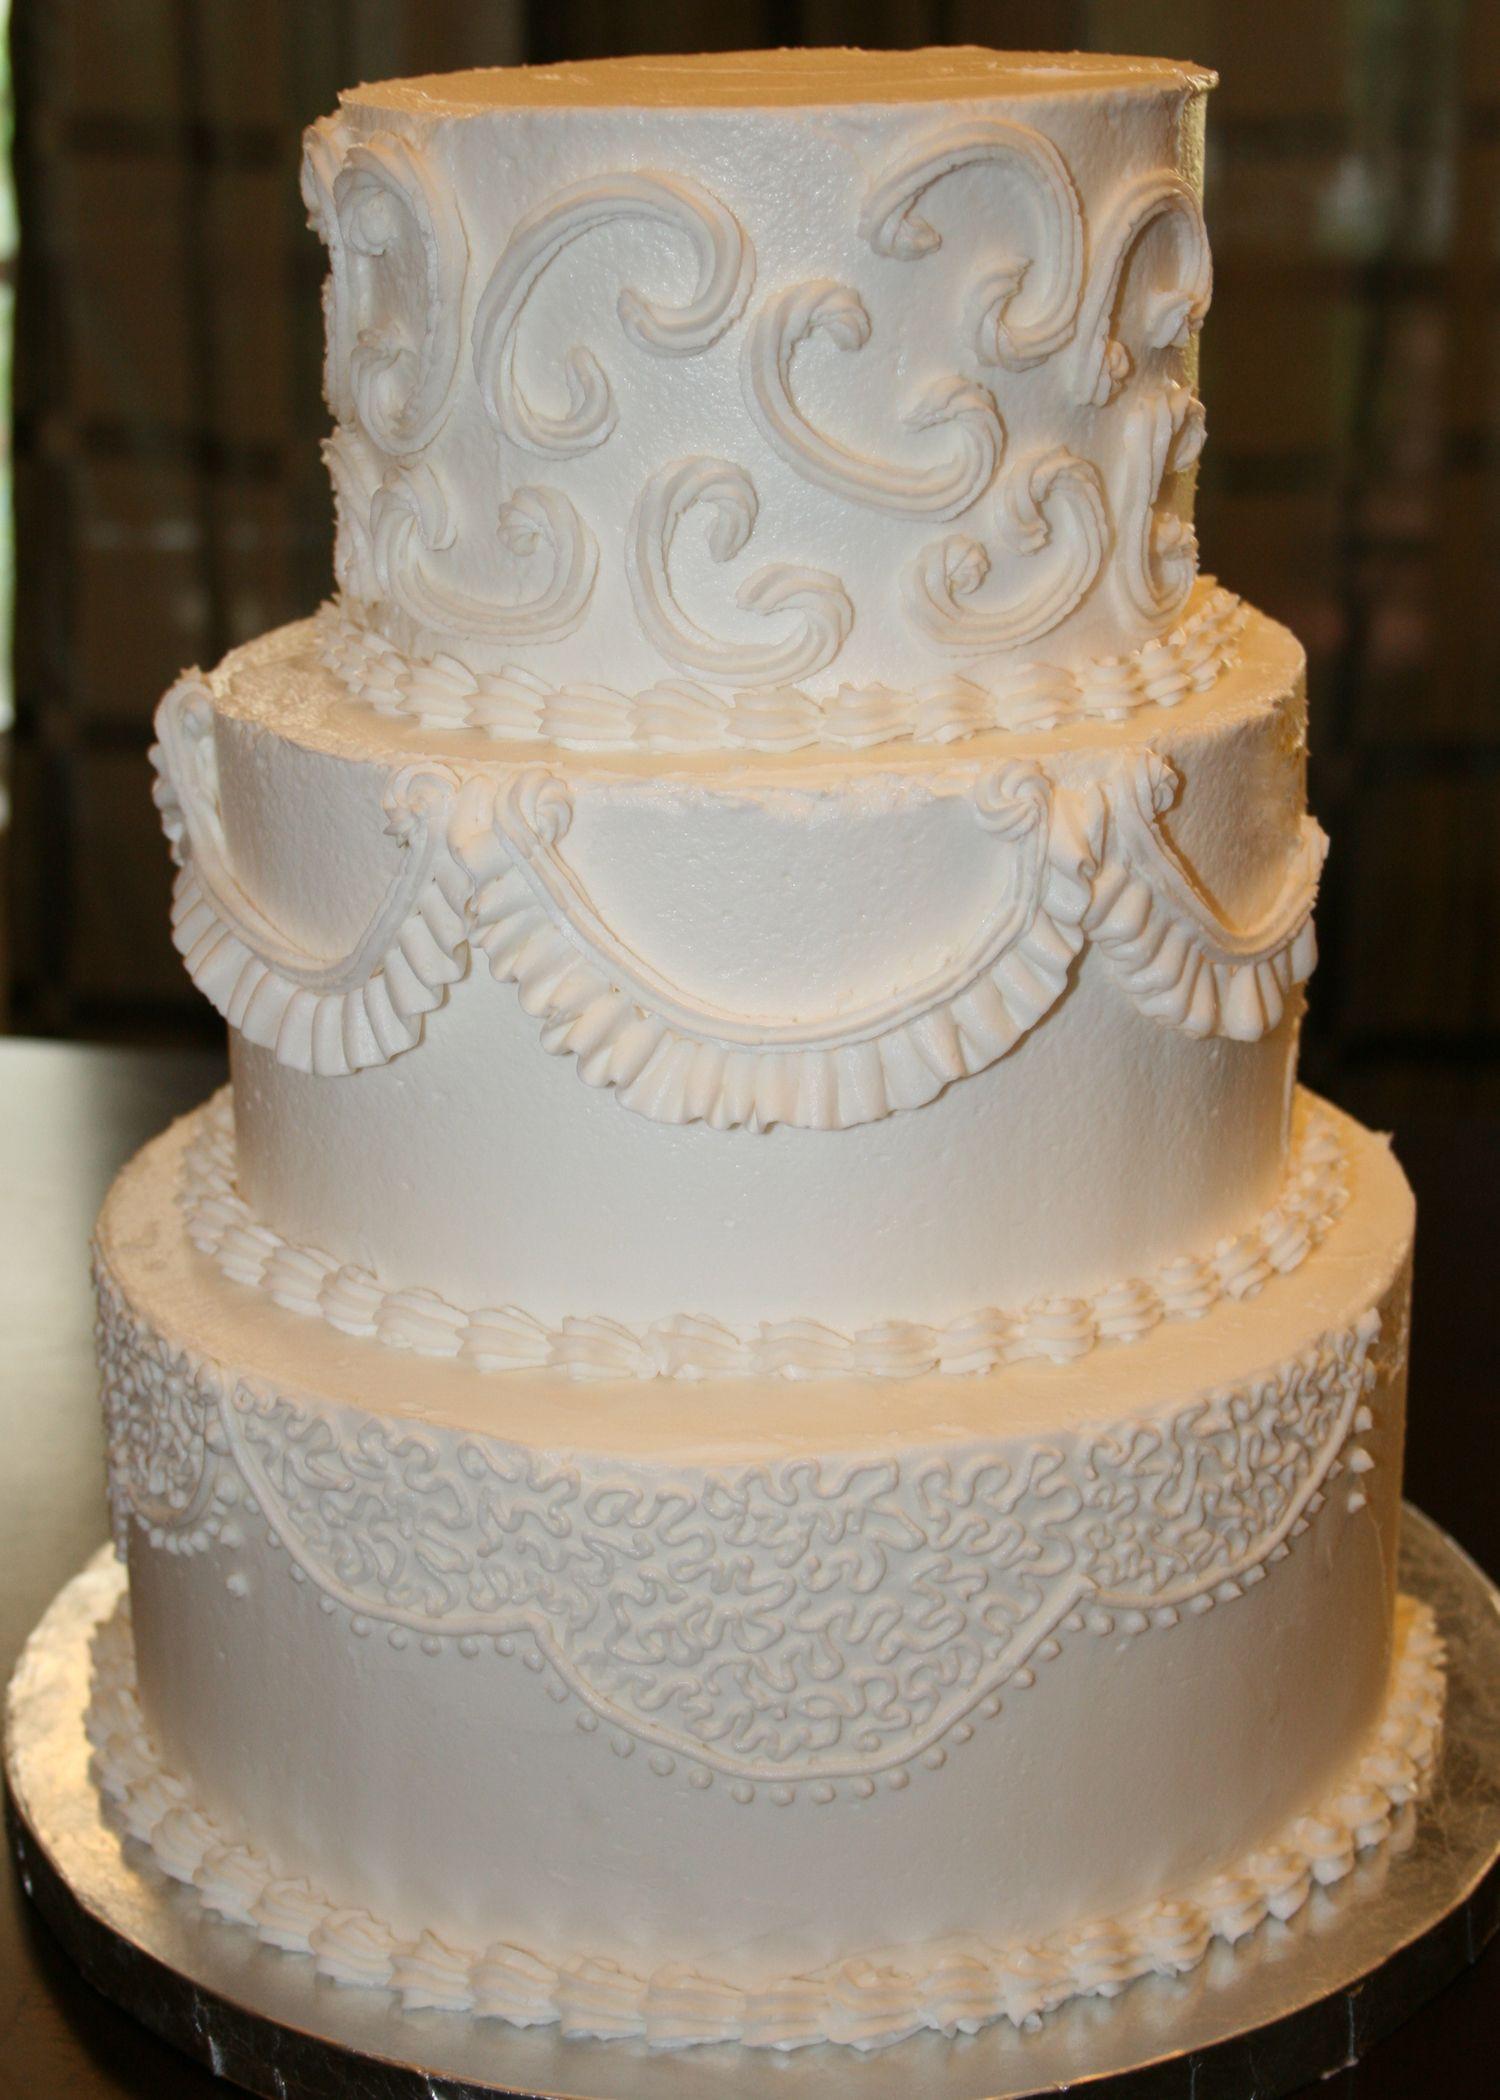 Wedding Cake Frosting Recipe  buttercream frosting wedding cakes